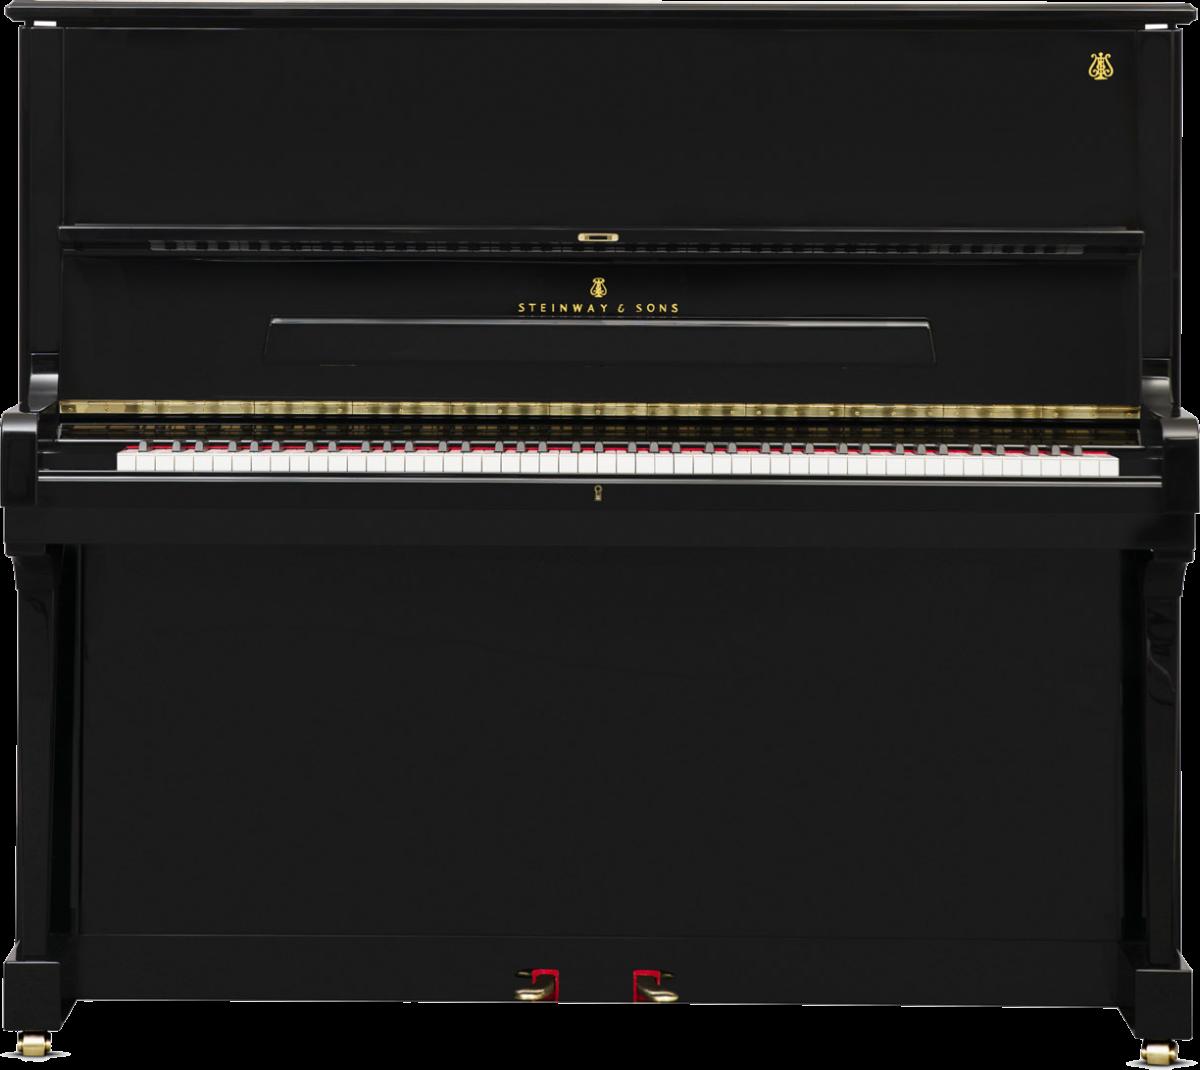 piano-vertical-steinway-sons-k132-artesanal-nuevo-negro-frontal-03